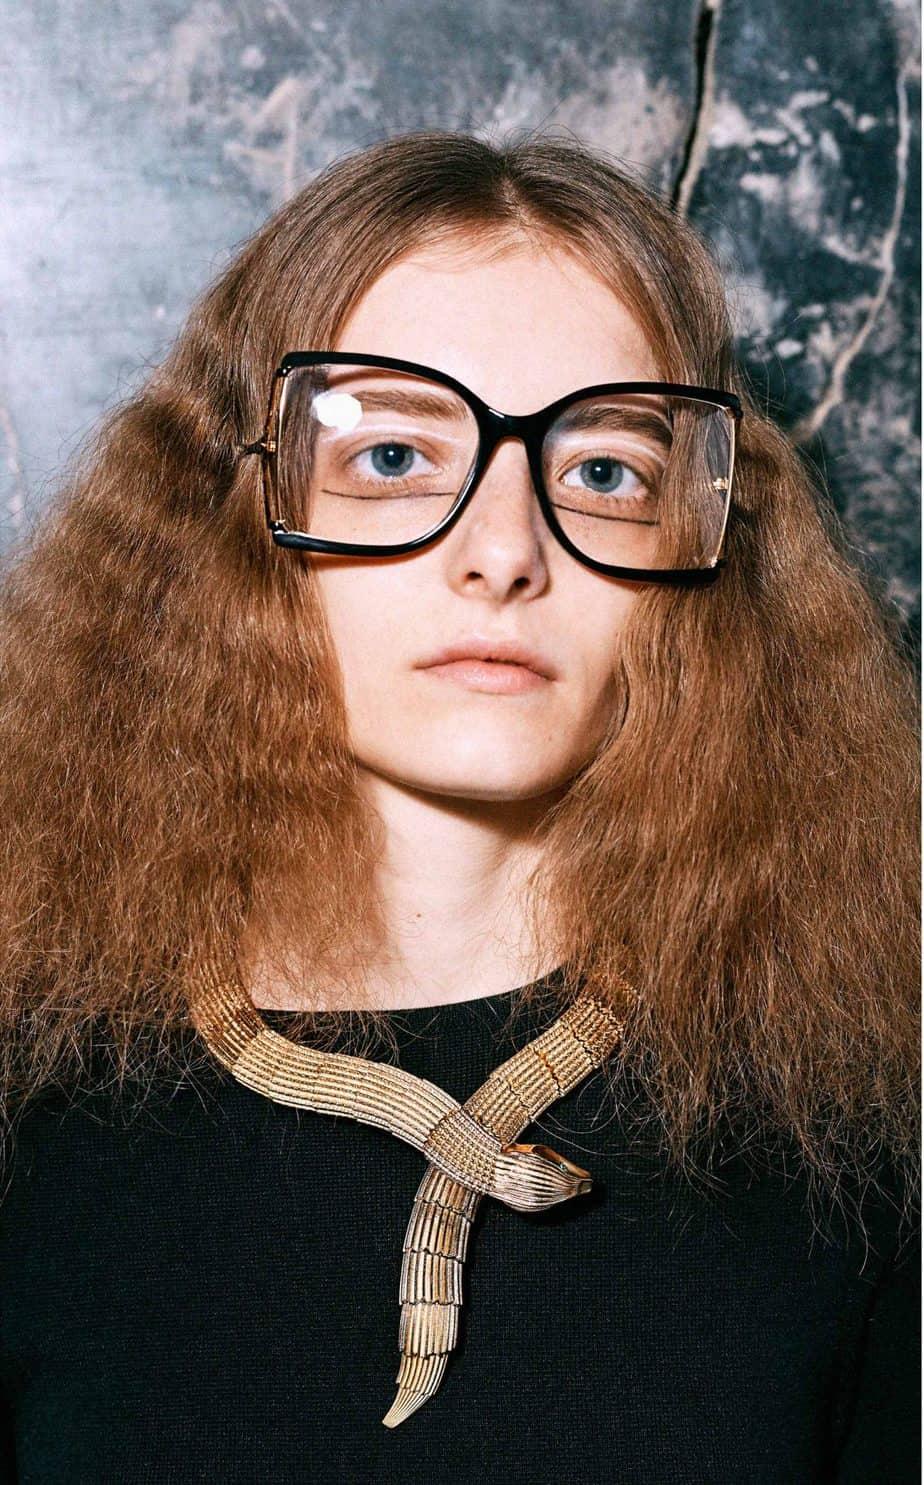 GUCCI, FALL 2019. WOMEN'S FASHION, Photographer Harmony Korine, Art Director, Christopher Simmonds - 63